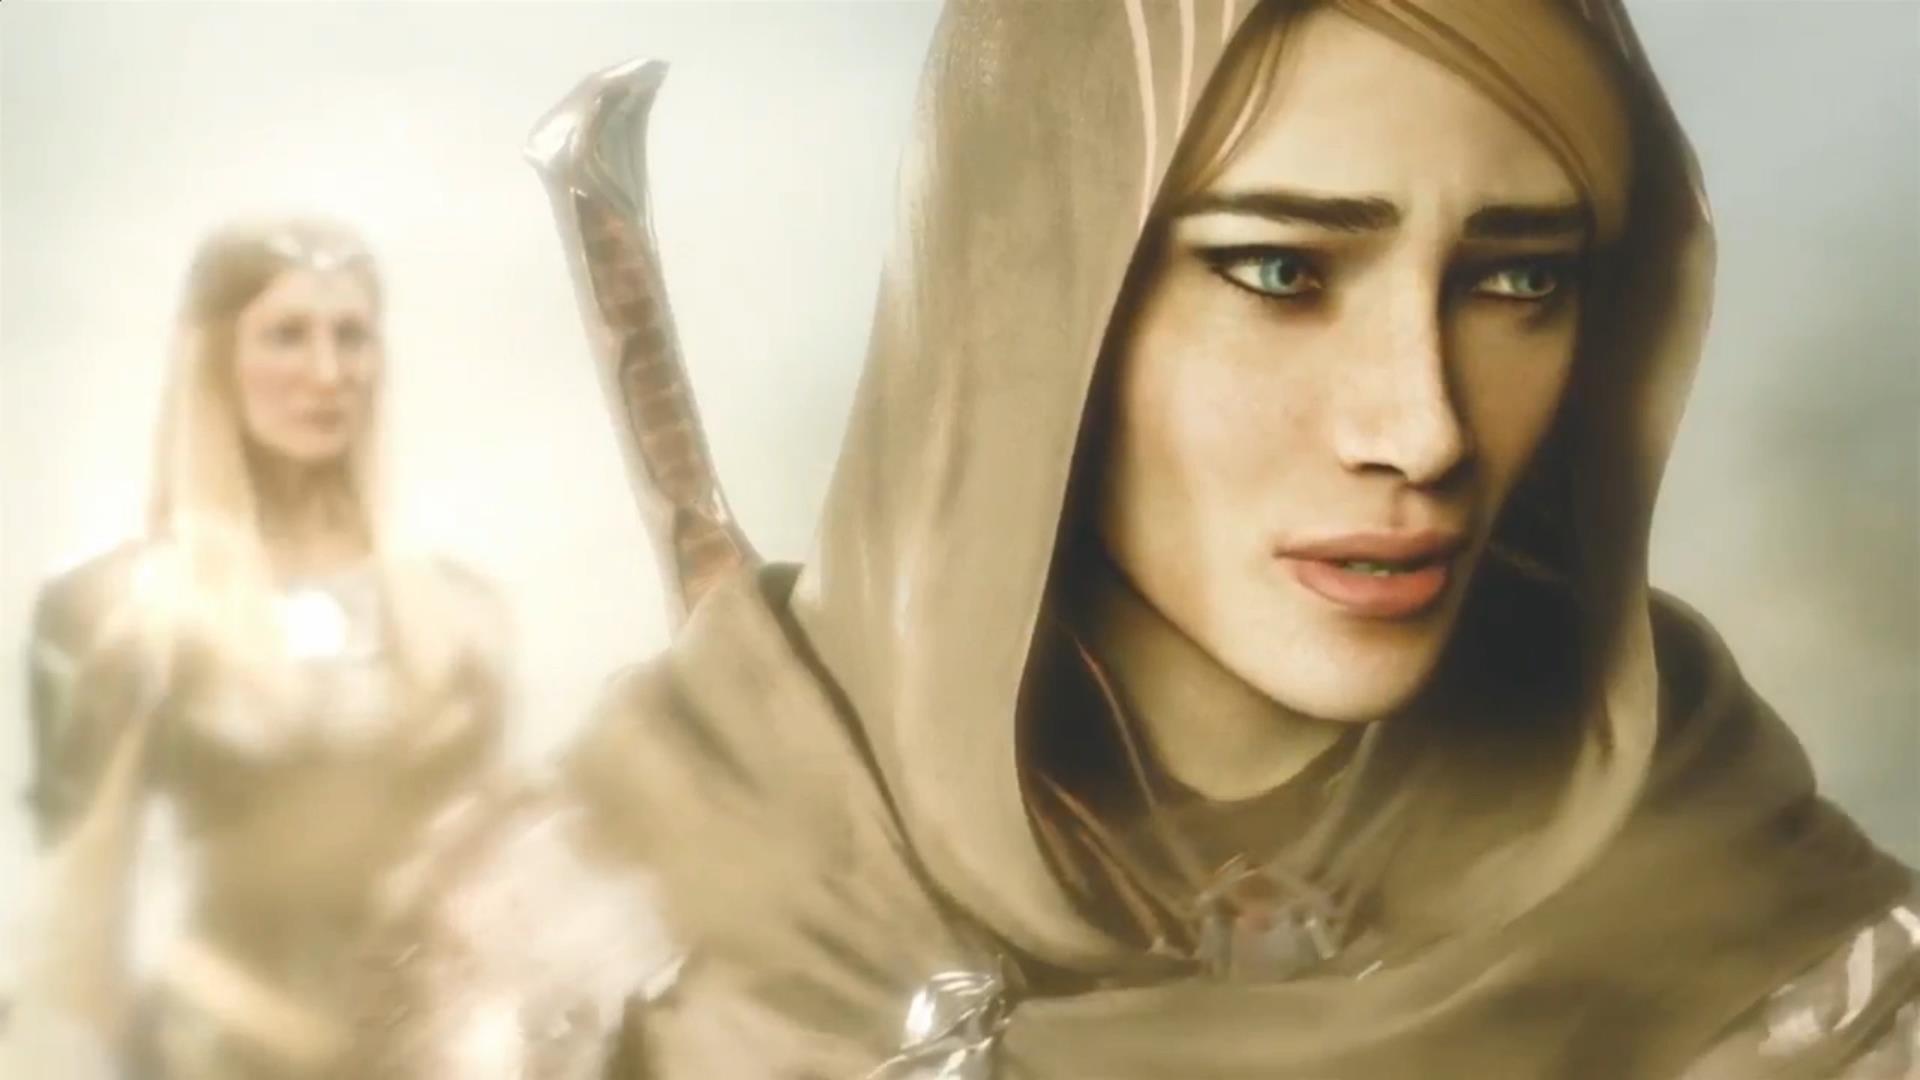 Middle-earth: Shadow of War – Blade of Galadriel; Eltariel, Galadriel